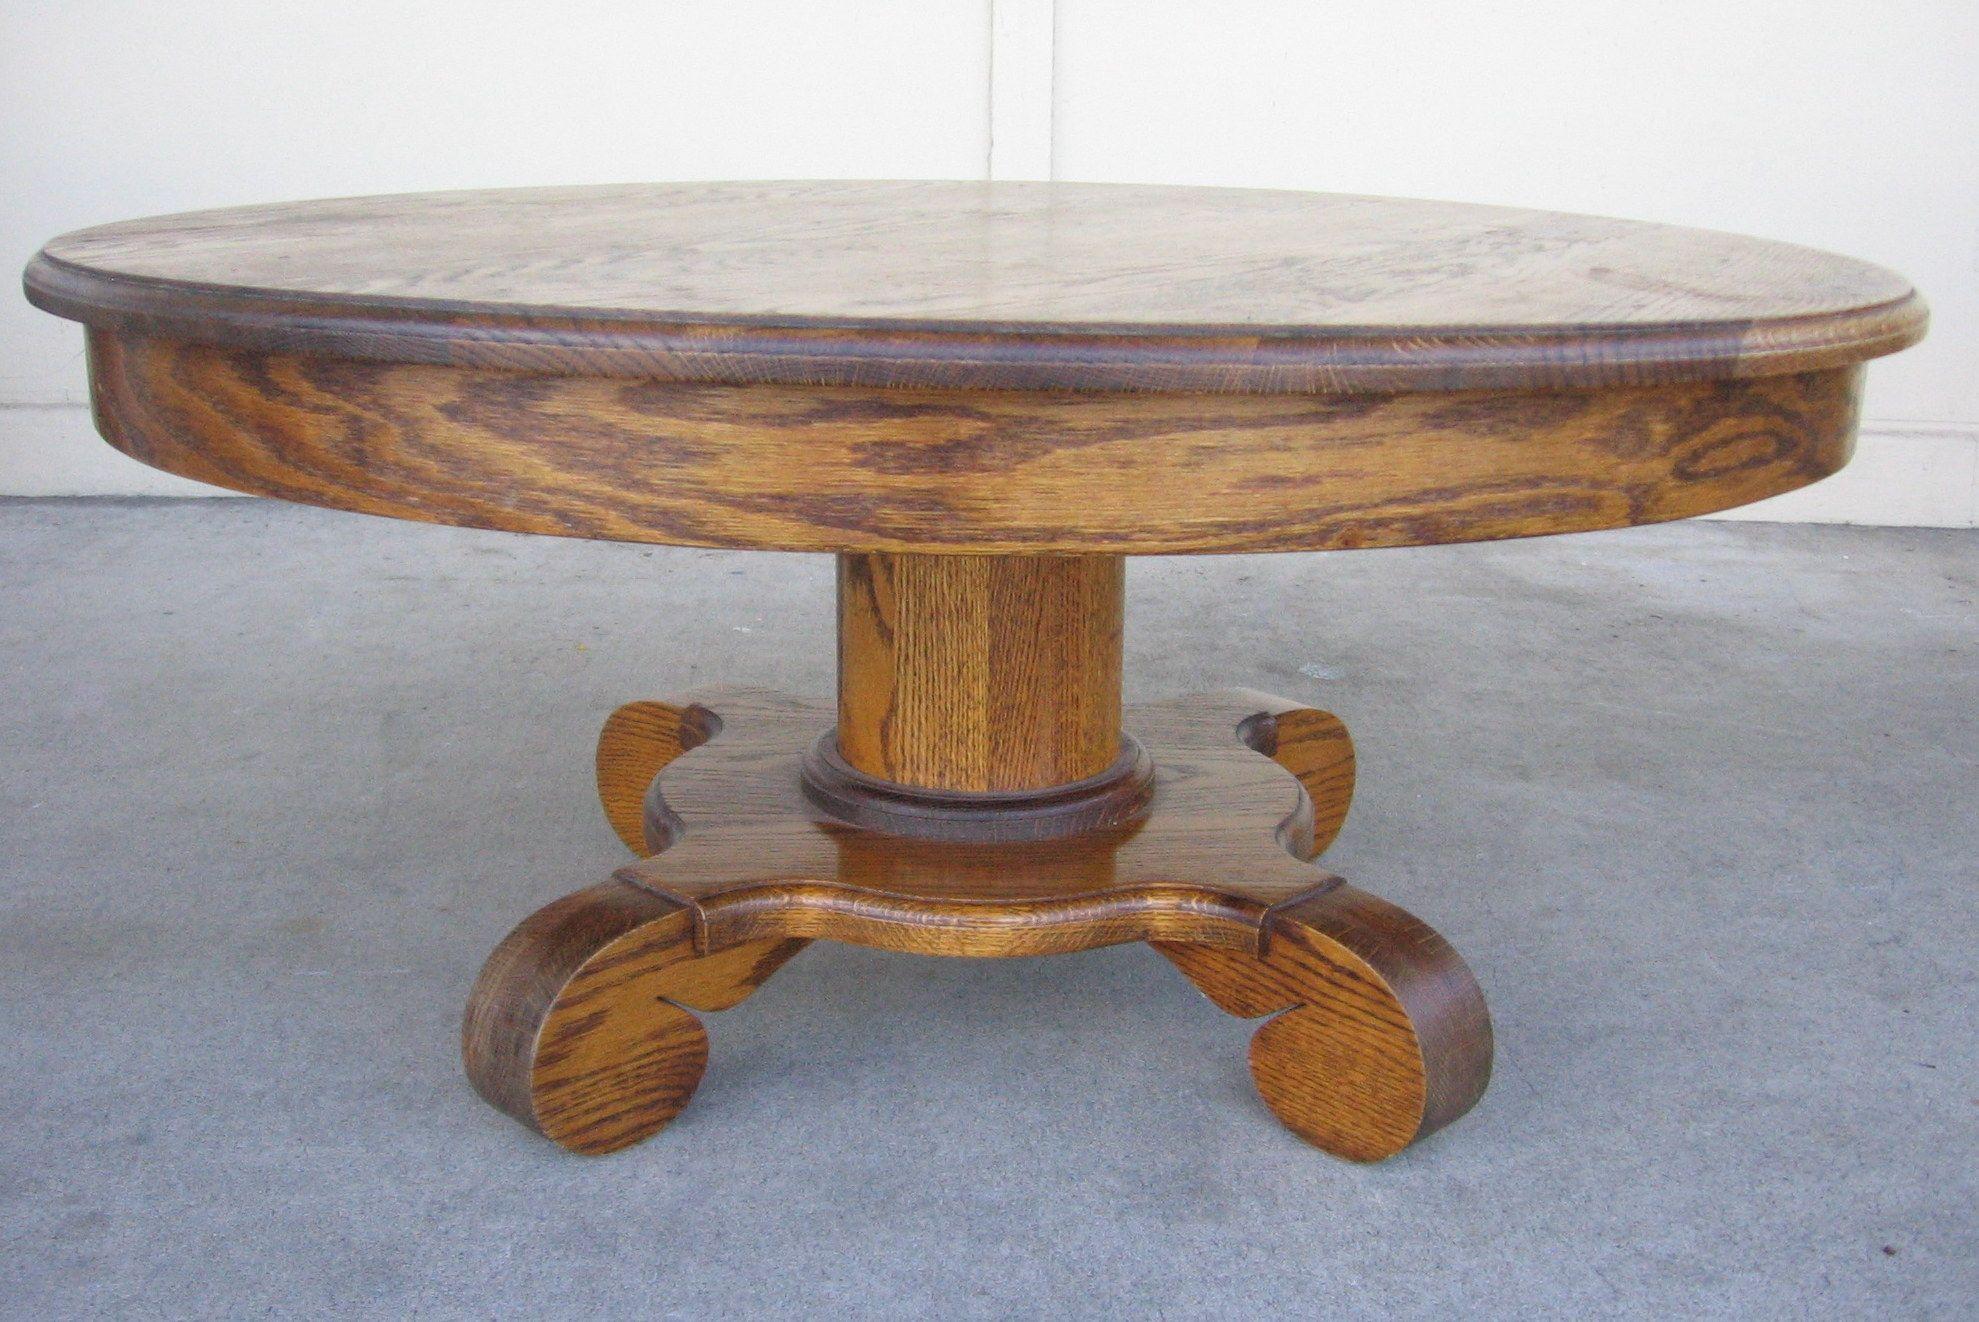 36 Round Oak Coffee Table Oak Coffee Table Home Goods Coffee Table [ 1322 x 1979 Pixel ]